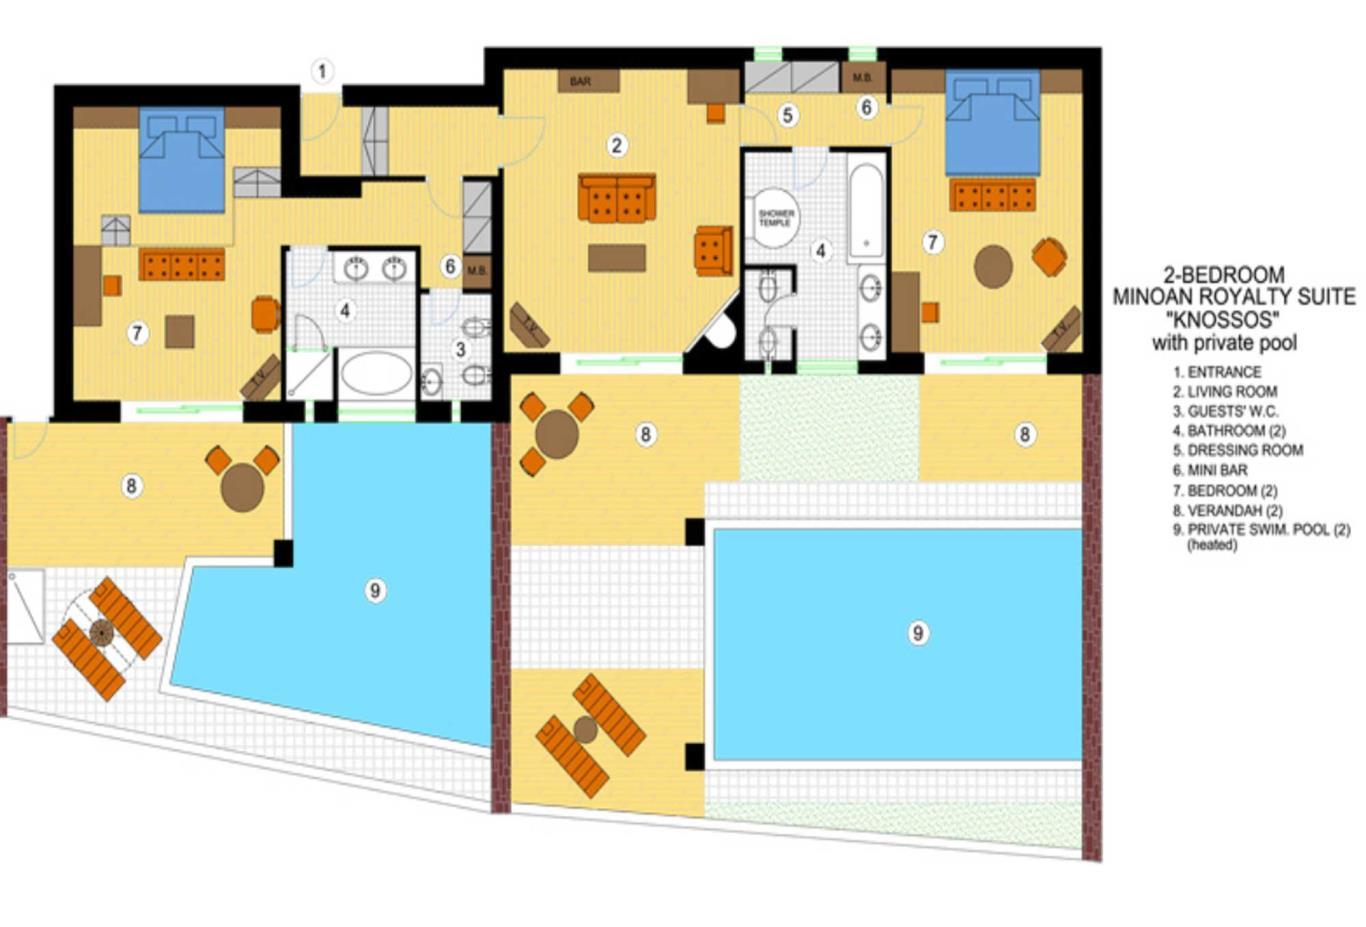 Two Bedroom Knossos Royalty Suite floorplan